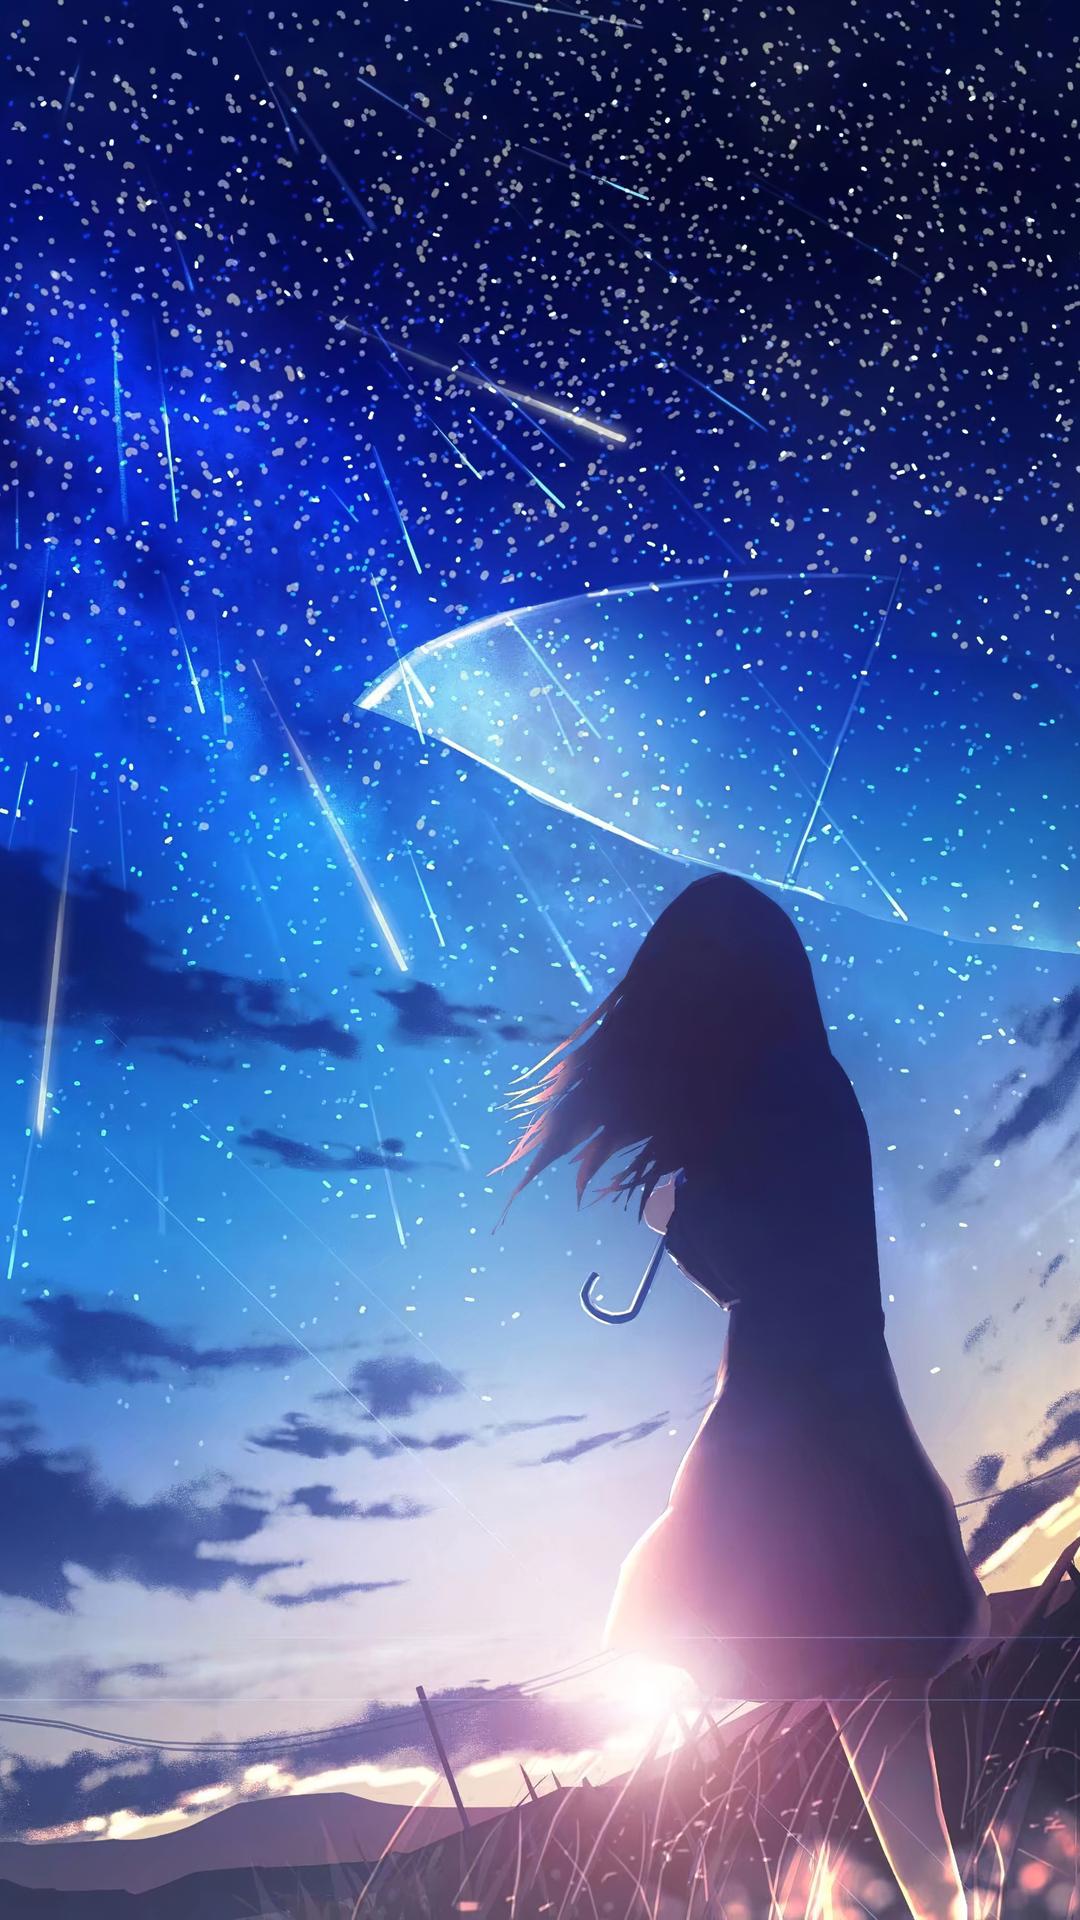 1080x1920 Anime Girl Umbrella Rain 4k Iphone 7,6s,6 Plus ...